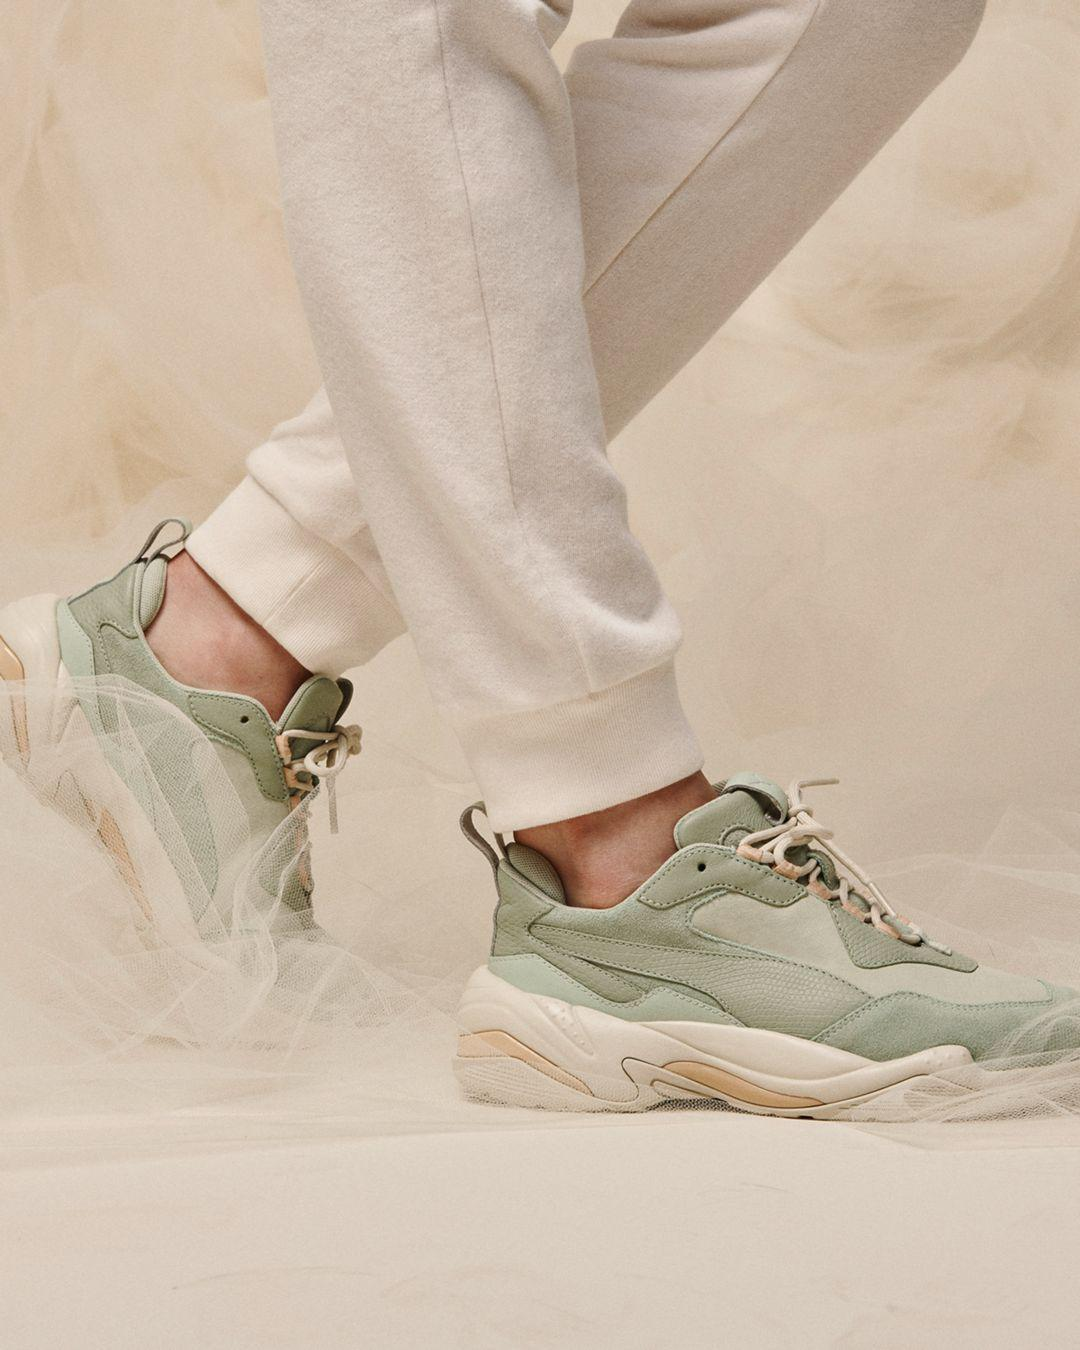 puma thunder desert green trainers